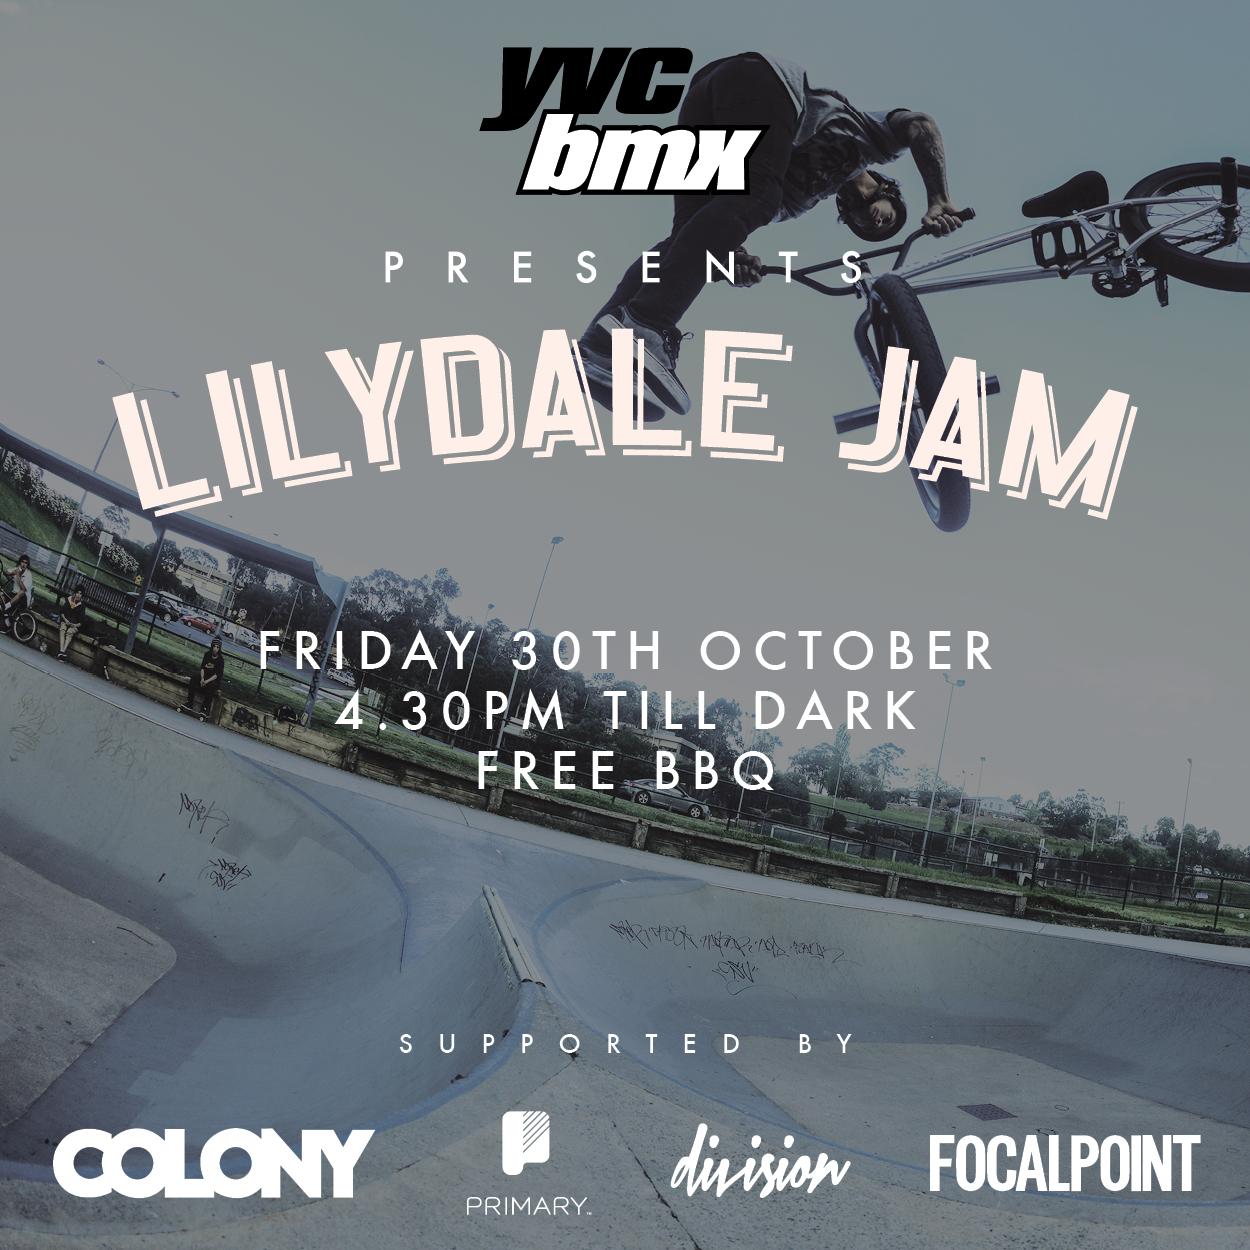 lilydale jam flyer